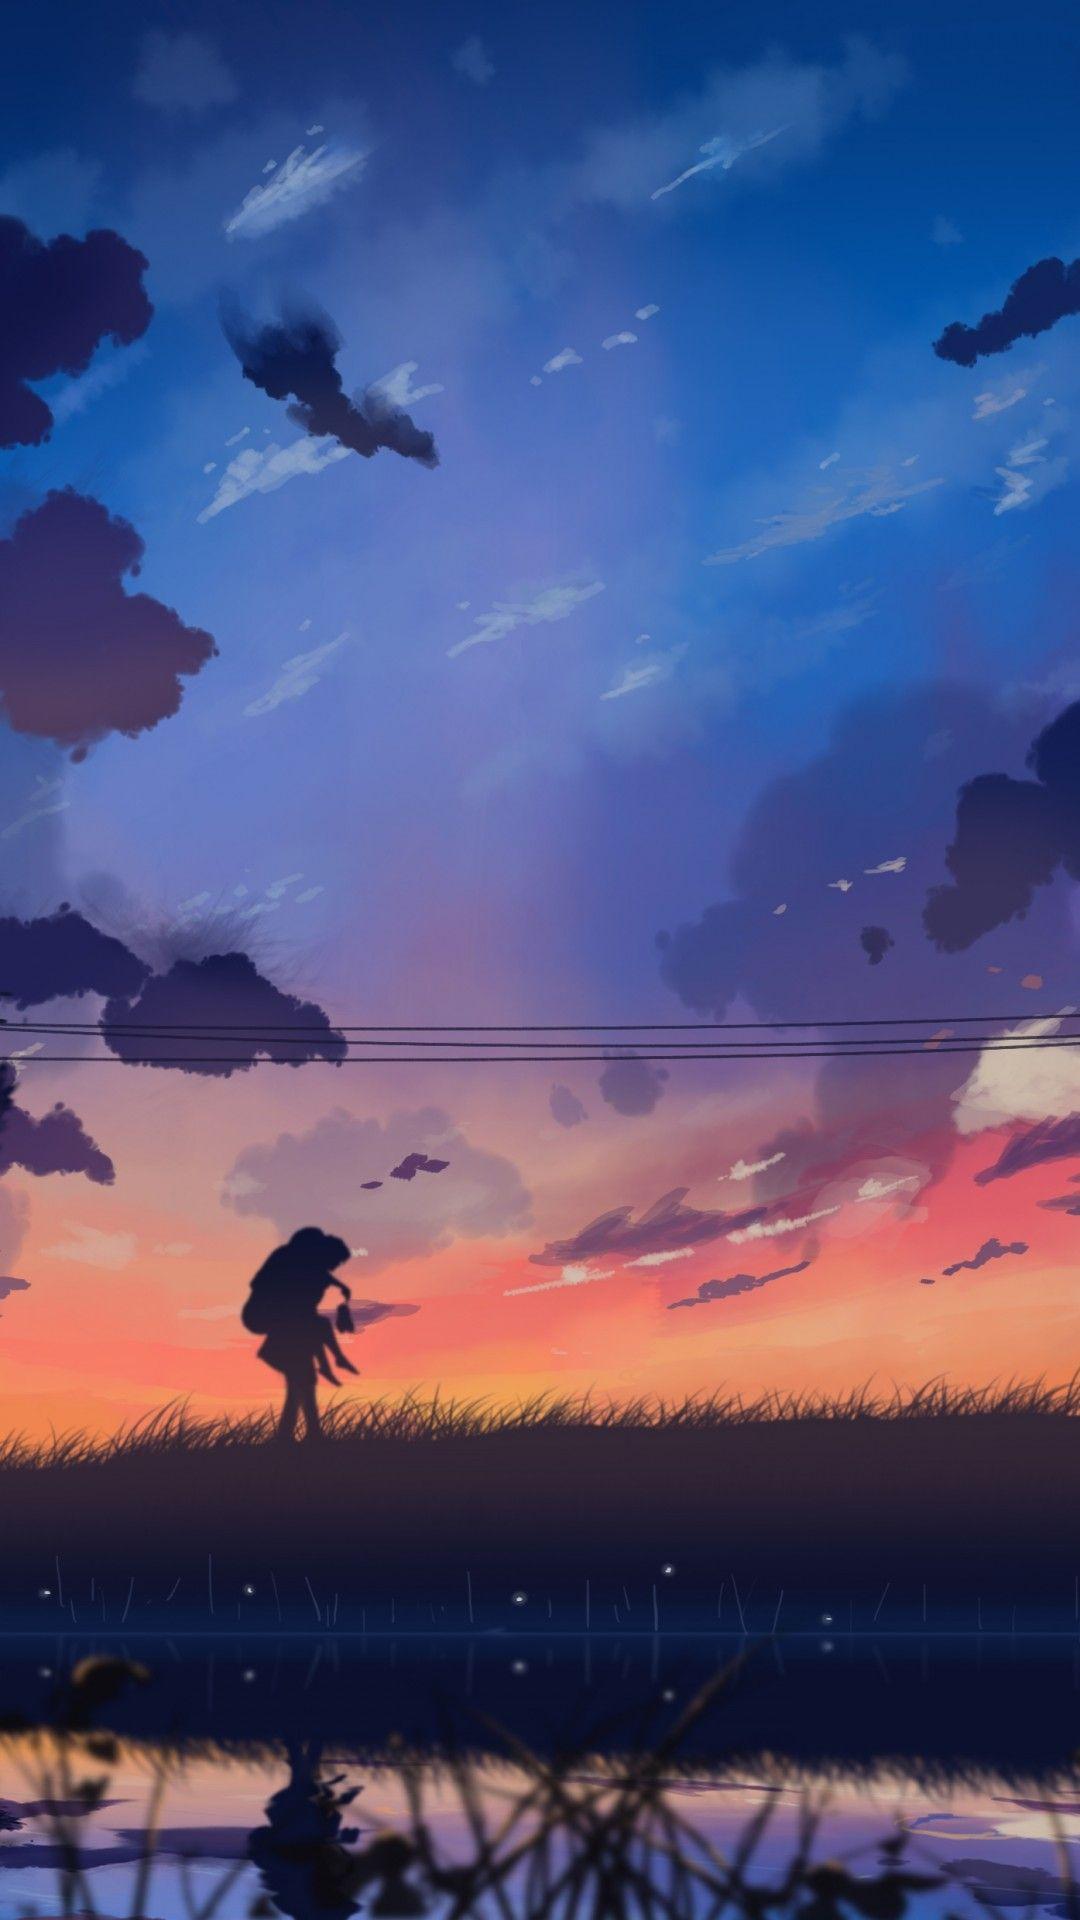 Anime Wallpaper Ipad : anime, wallpaper, Scenery, Anime, Wallpaper